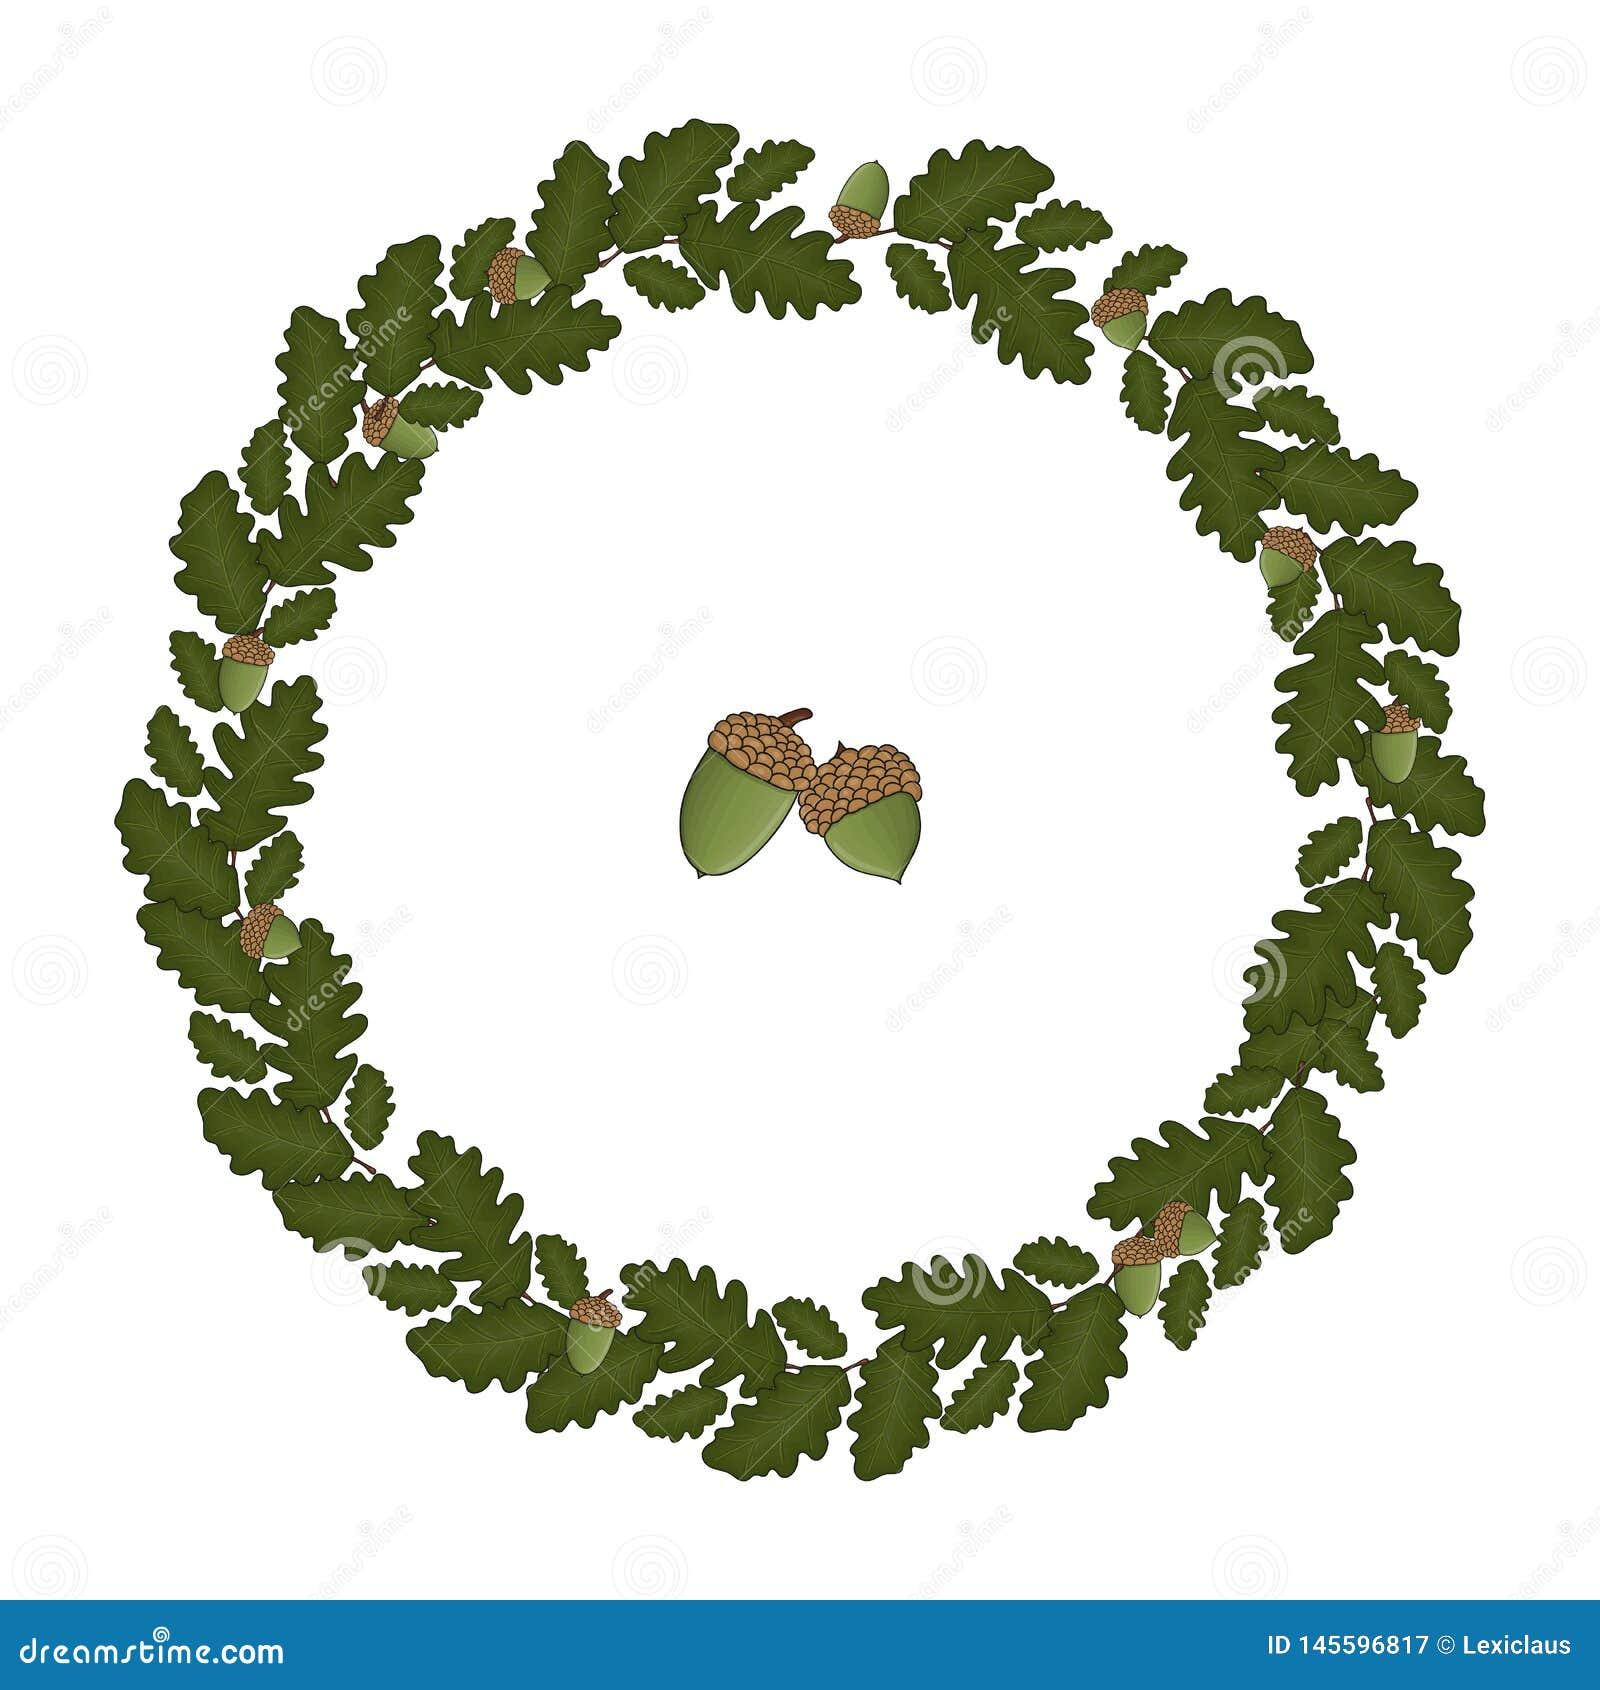 Vector wreath of oak leaves